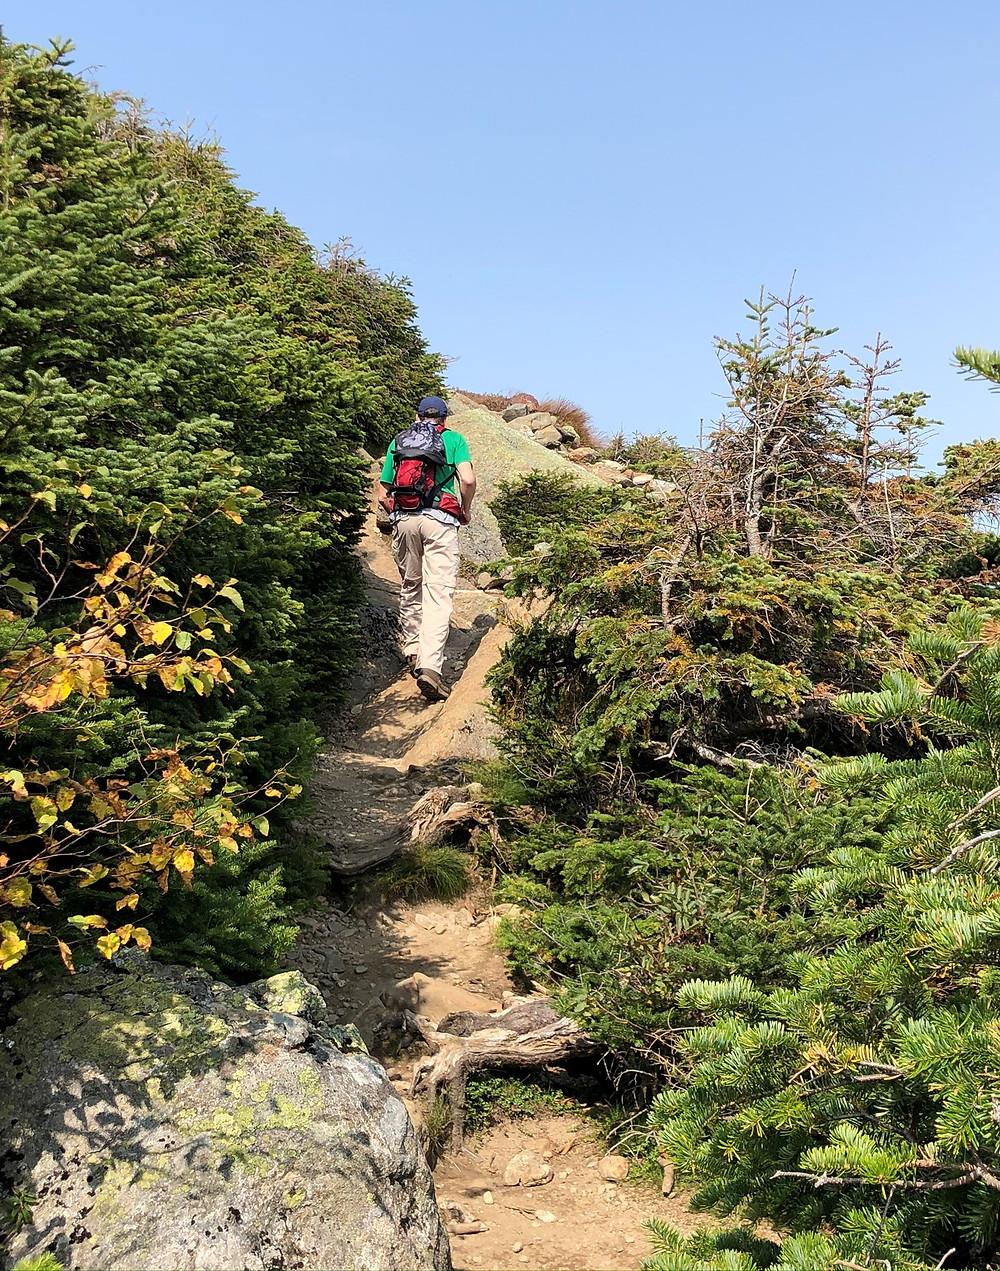 Climbing rocky crag on Mt Eisenhower Loop Trail